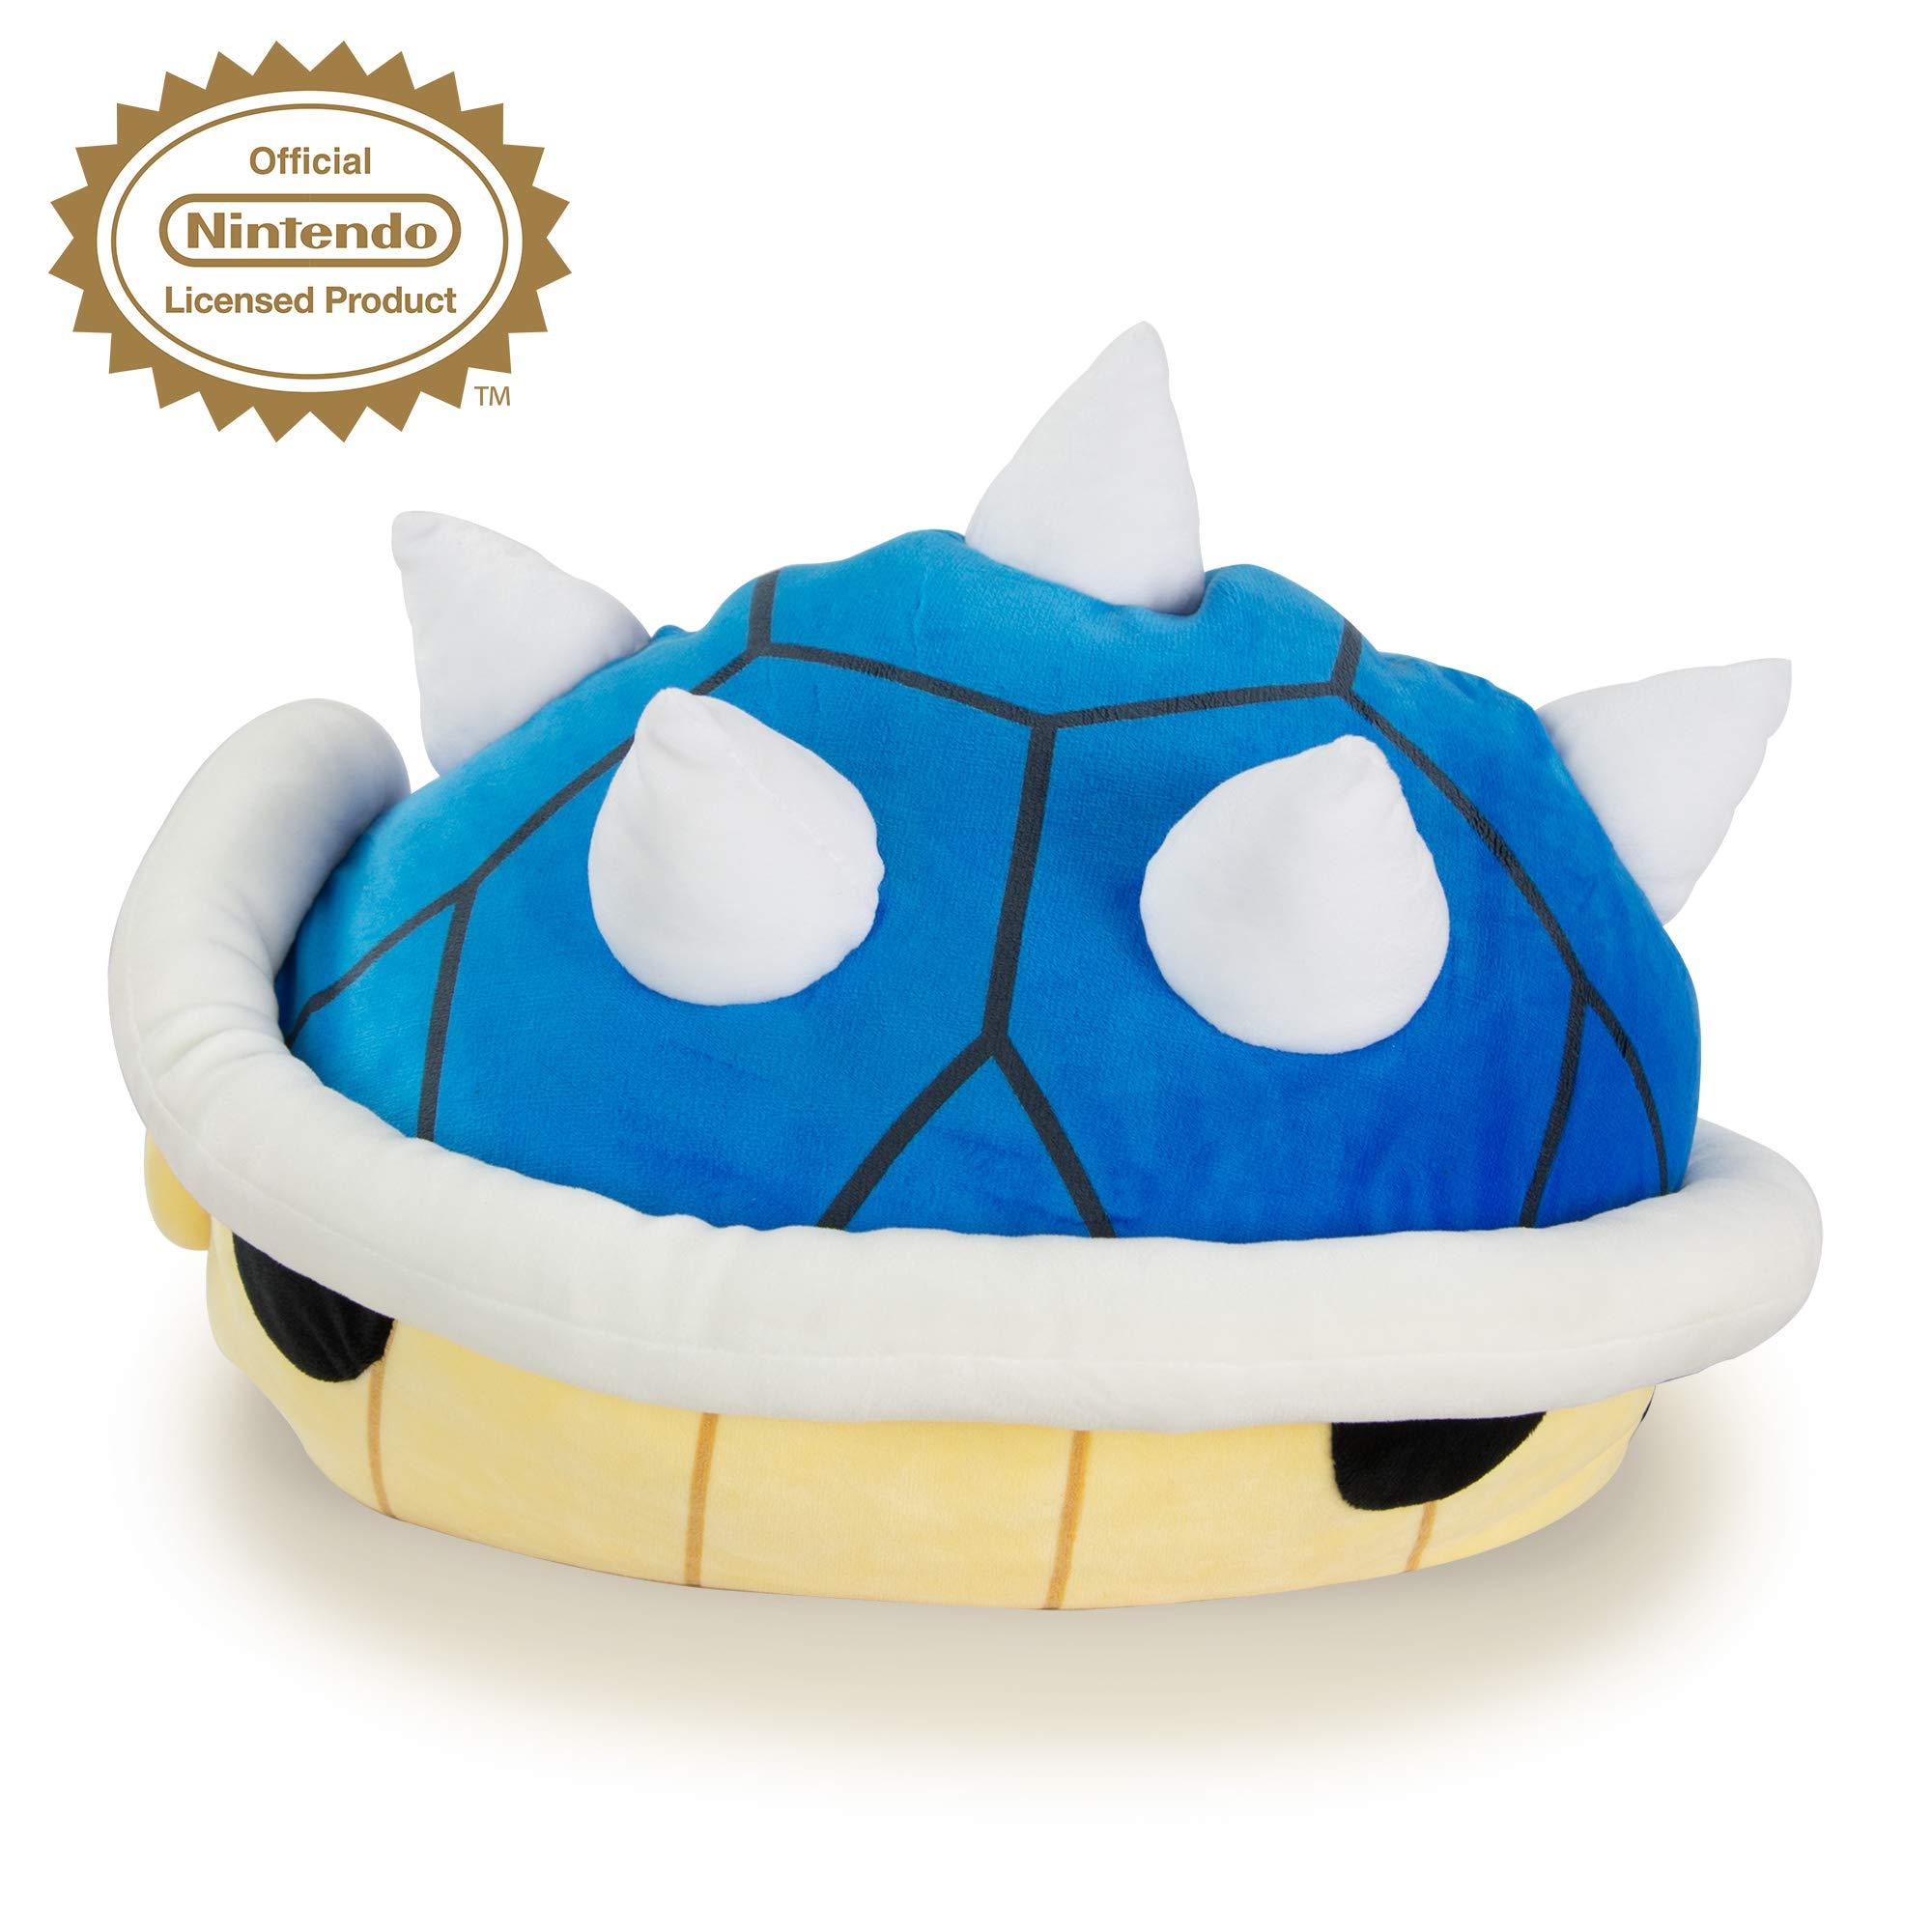 Club Mocchi Mocchi Nintendo Mario Kart Blue Shell Plush Stuffed Toy by Club Mocchi Mocchi